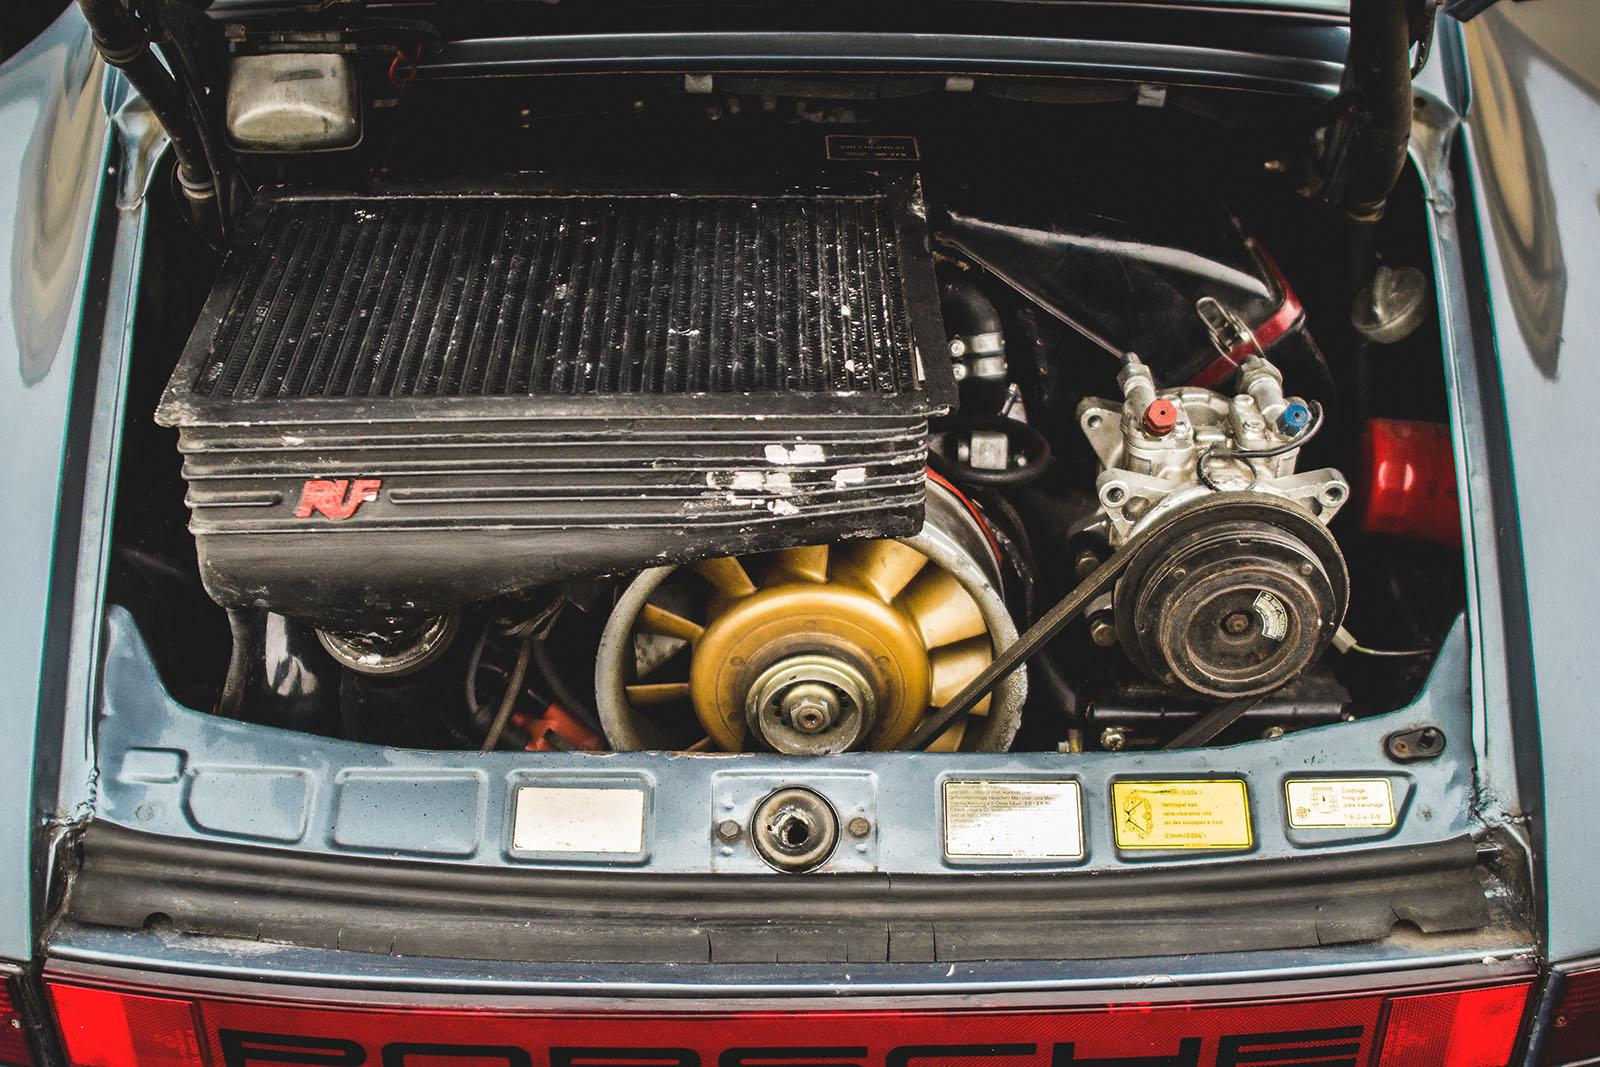 Porsche 911 Turbo 3.3 (1983) For Sale (picture 6 of 6)